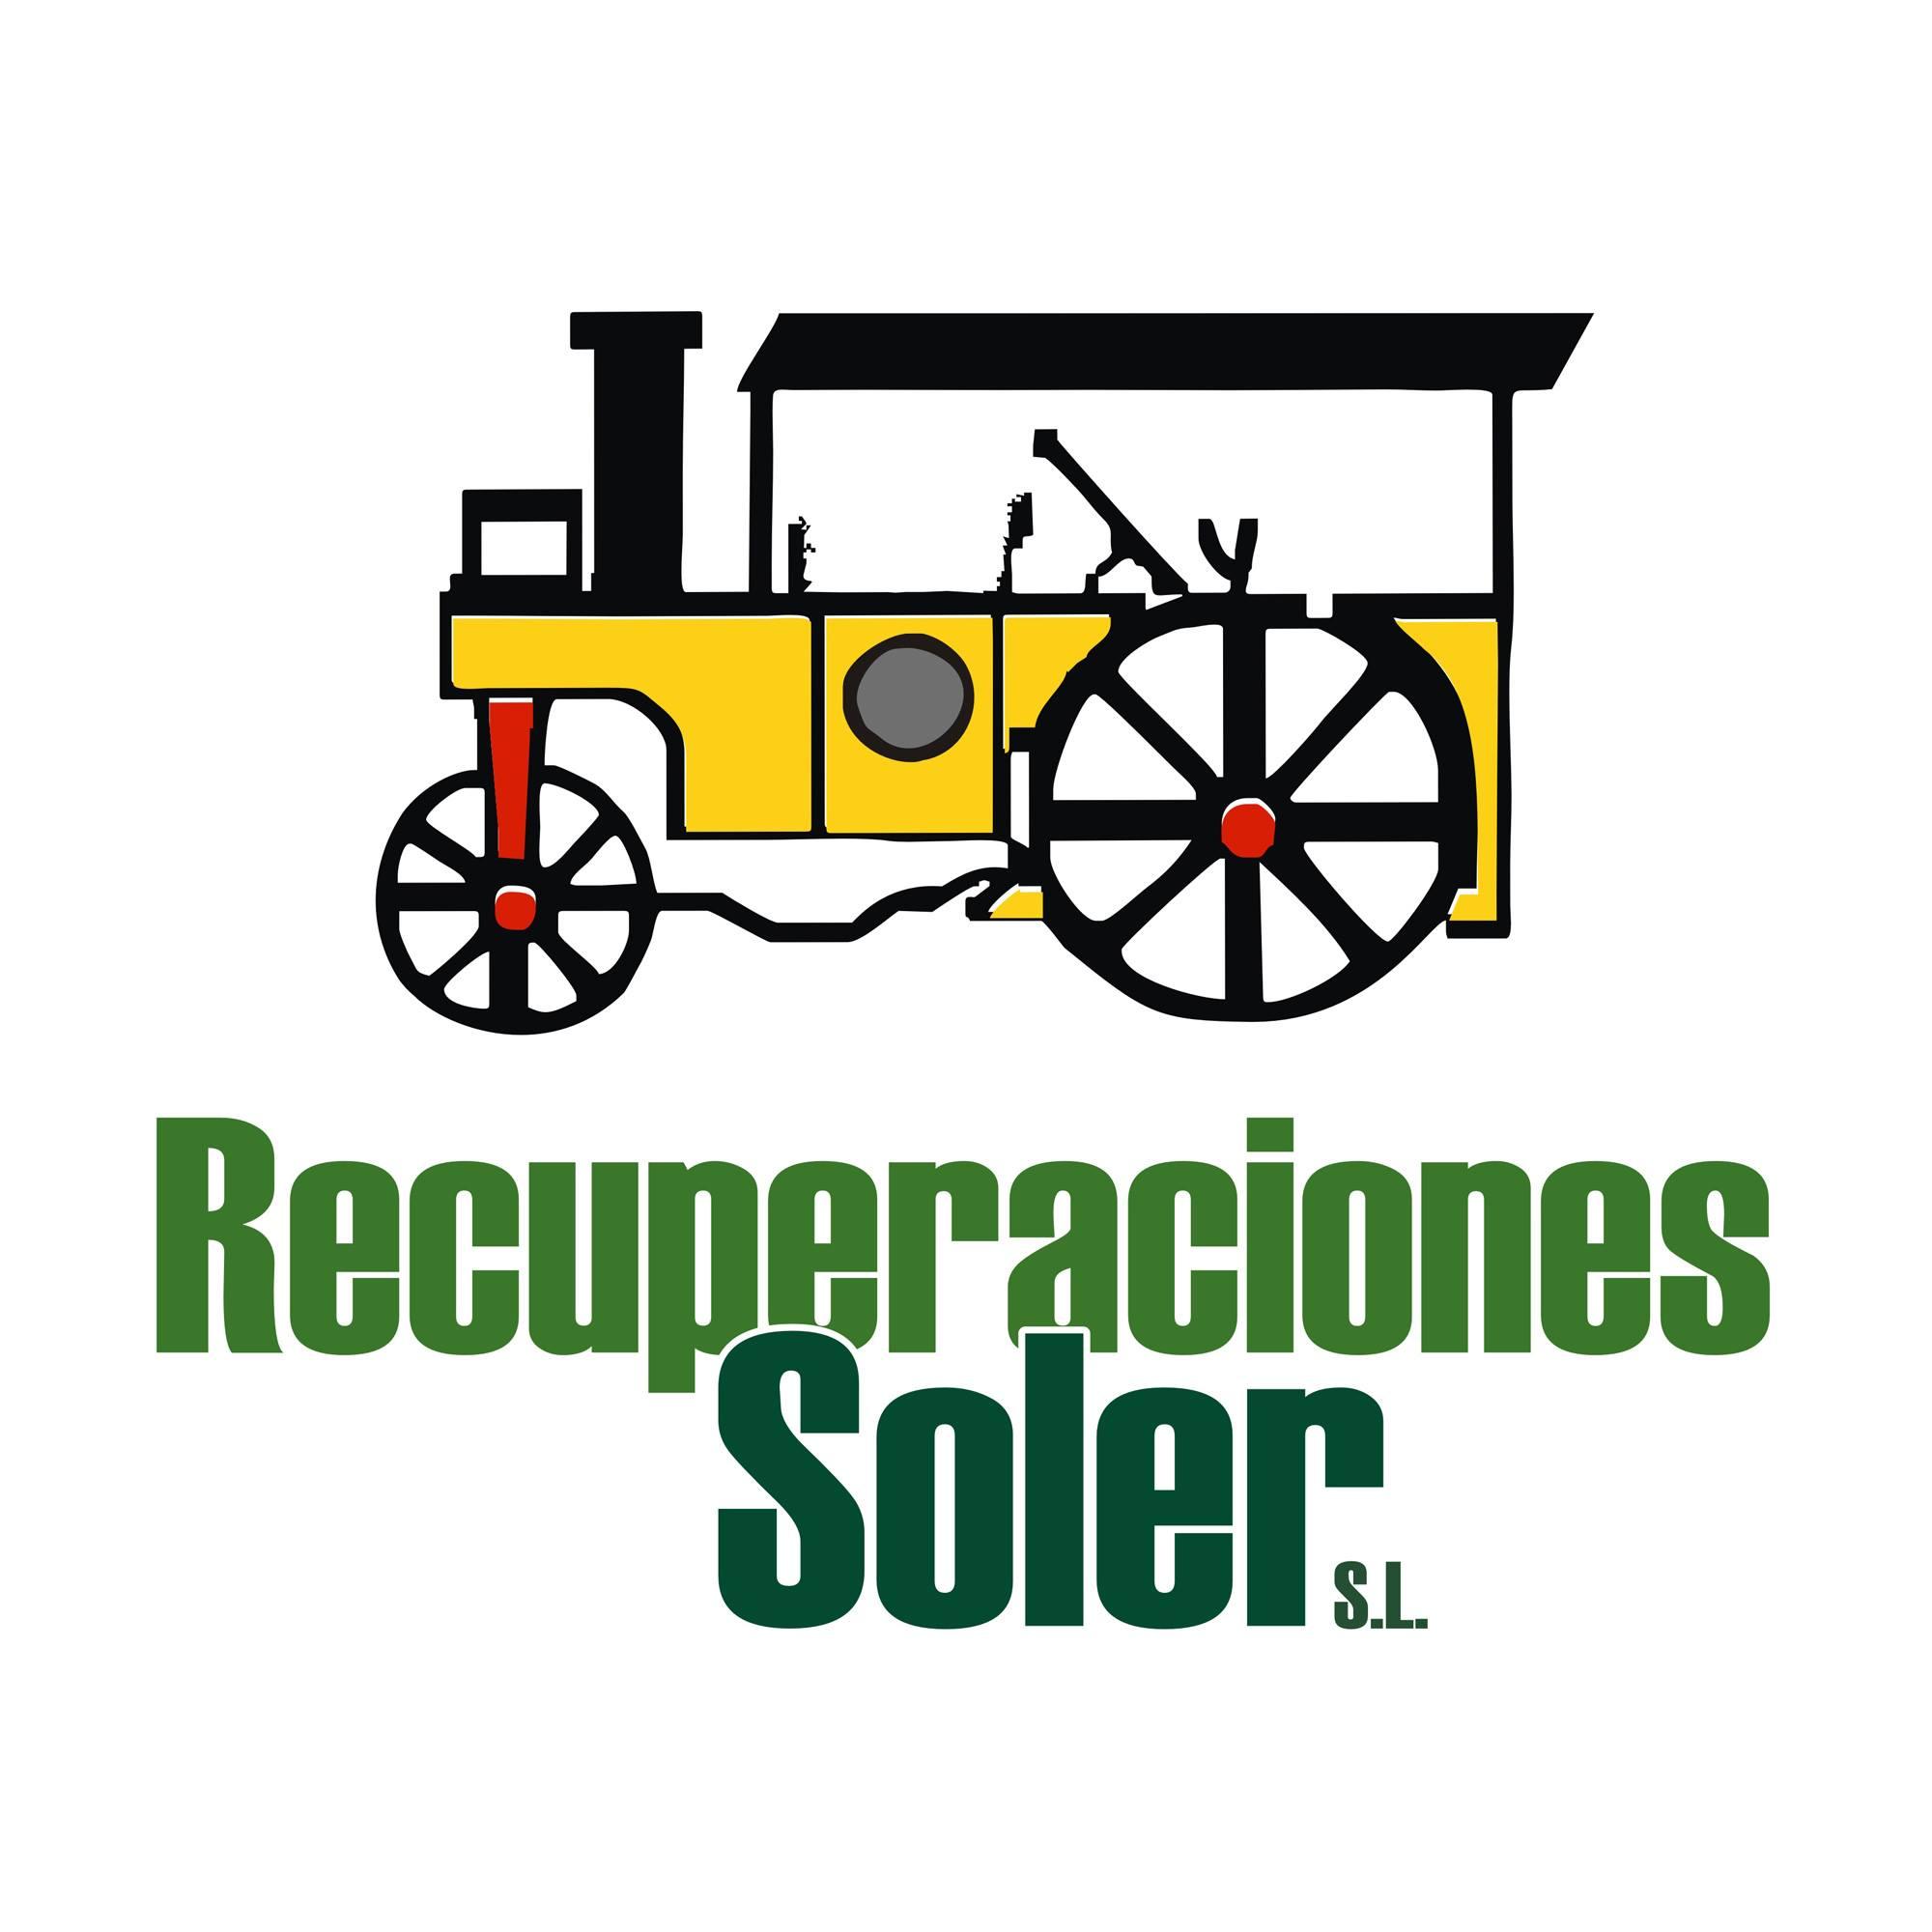 logo_recuperaciones soler